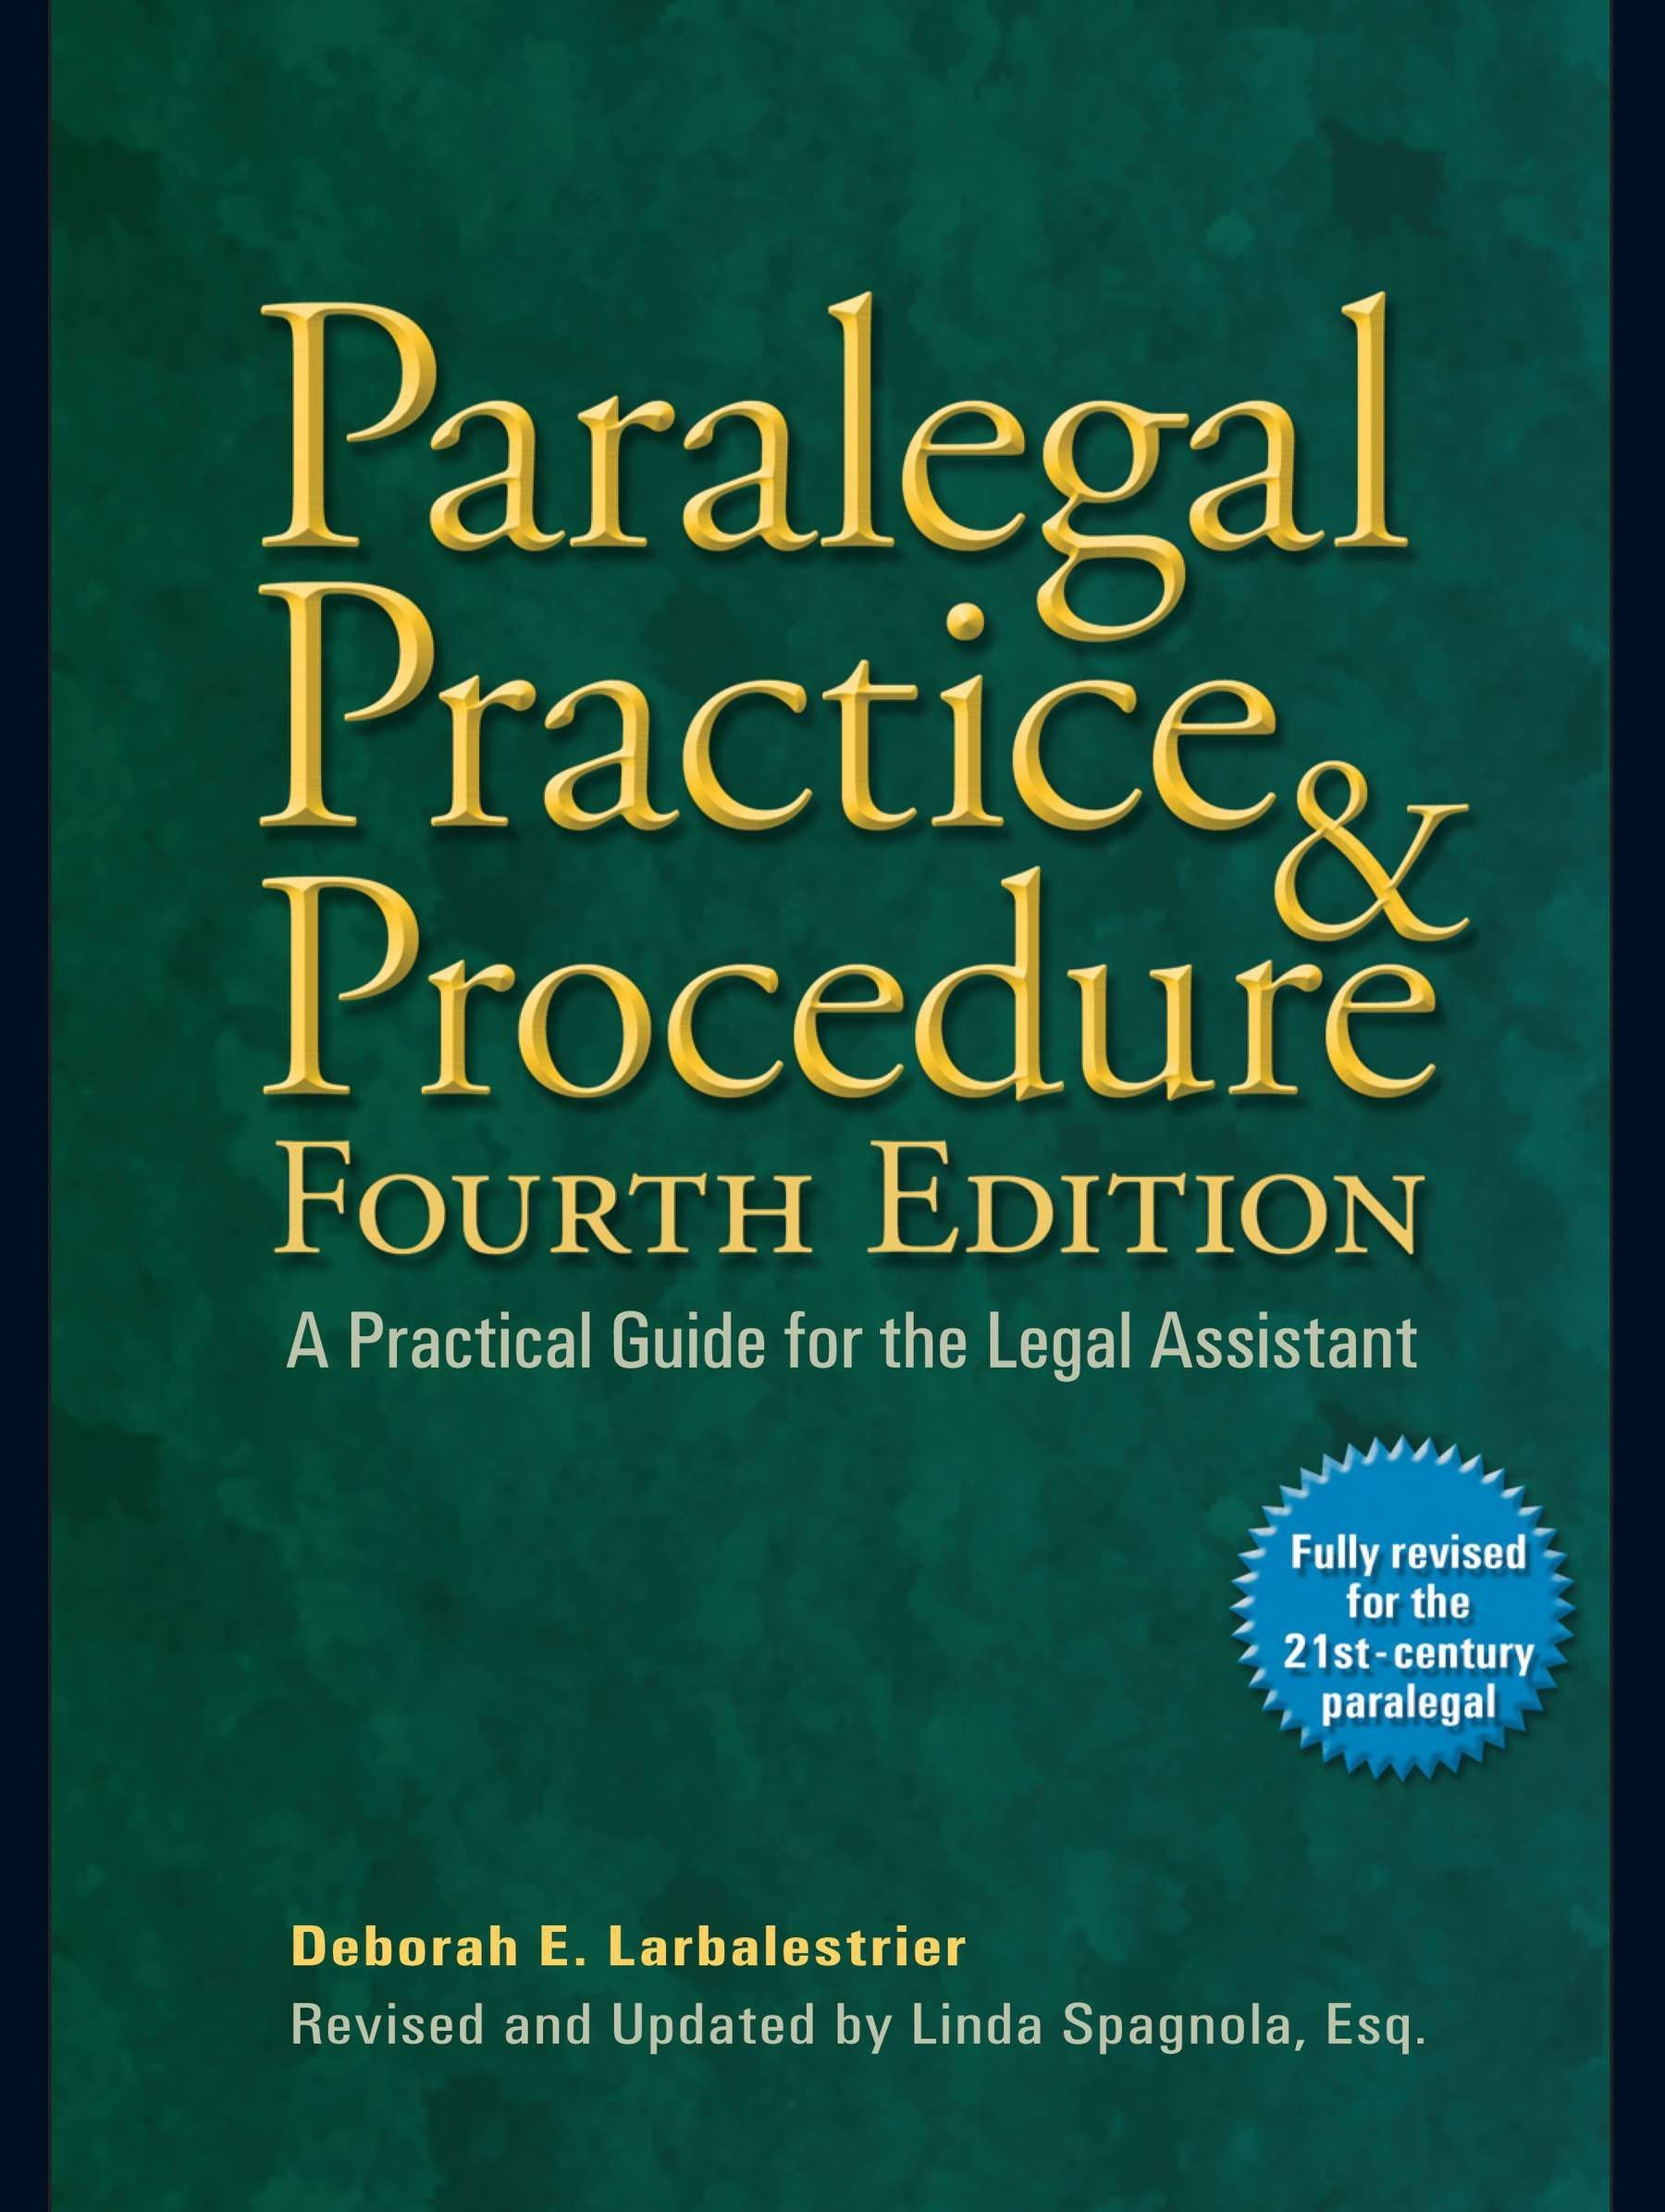 Paralegal Practice & Procedure Fourth Edition: A Practical Guide for the  Legal Assistant: Deborah E. Larbalestrier, Linda Spagnola Esq.:  9780735204331: ...